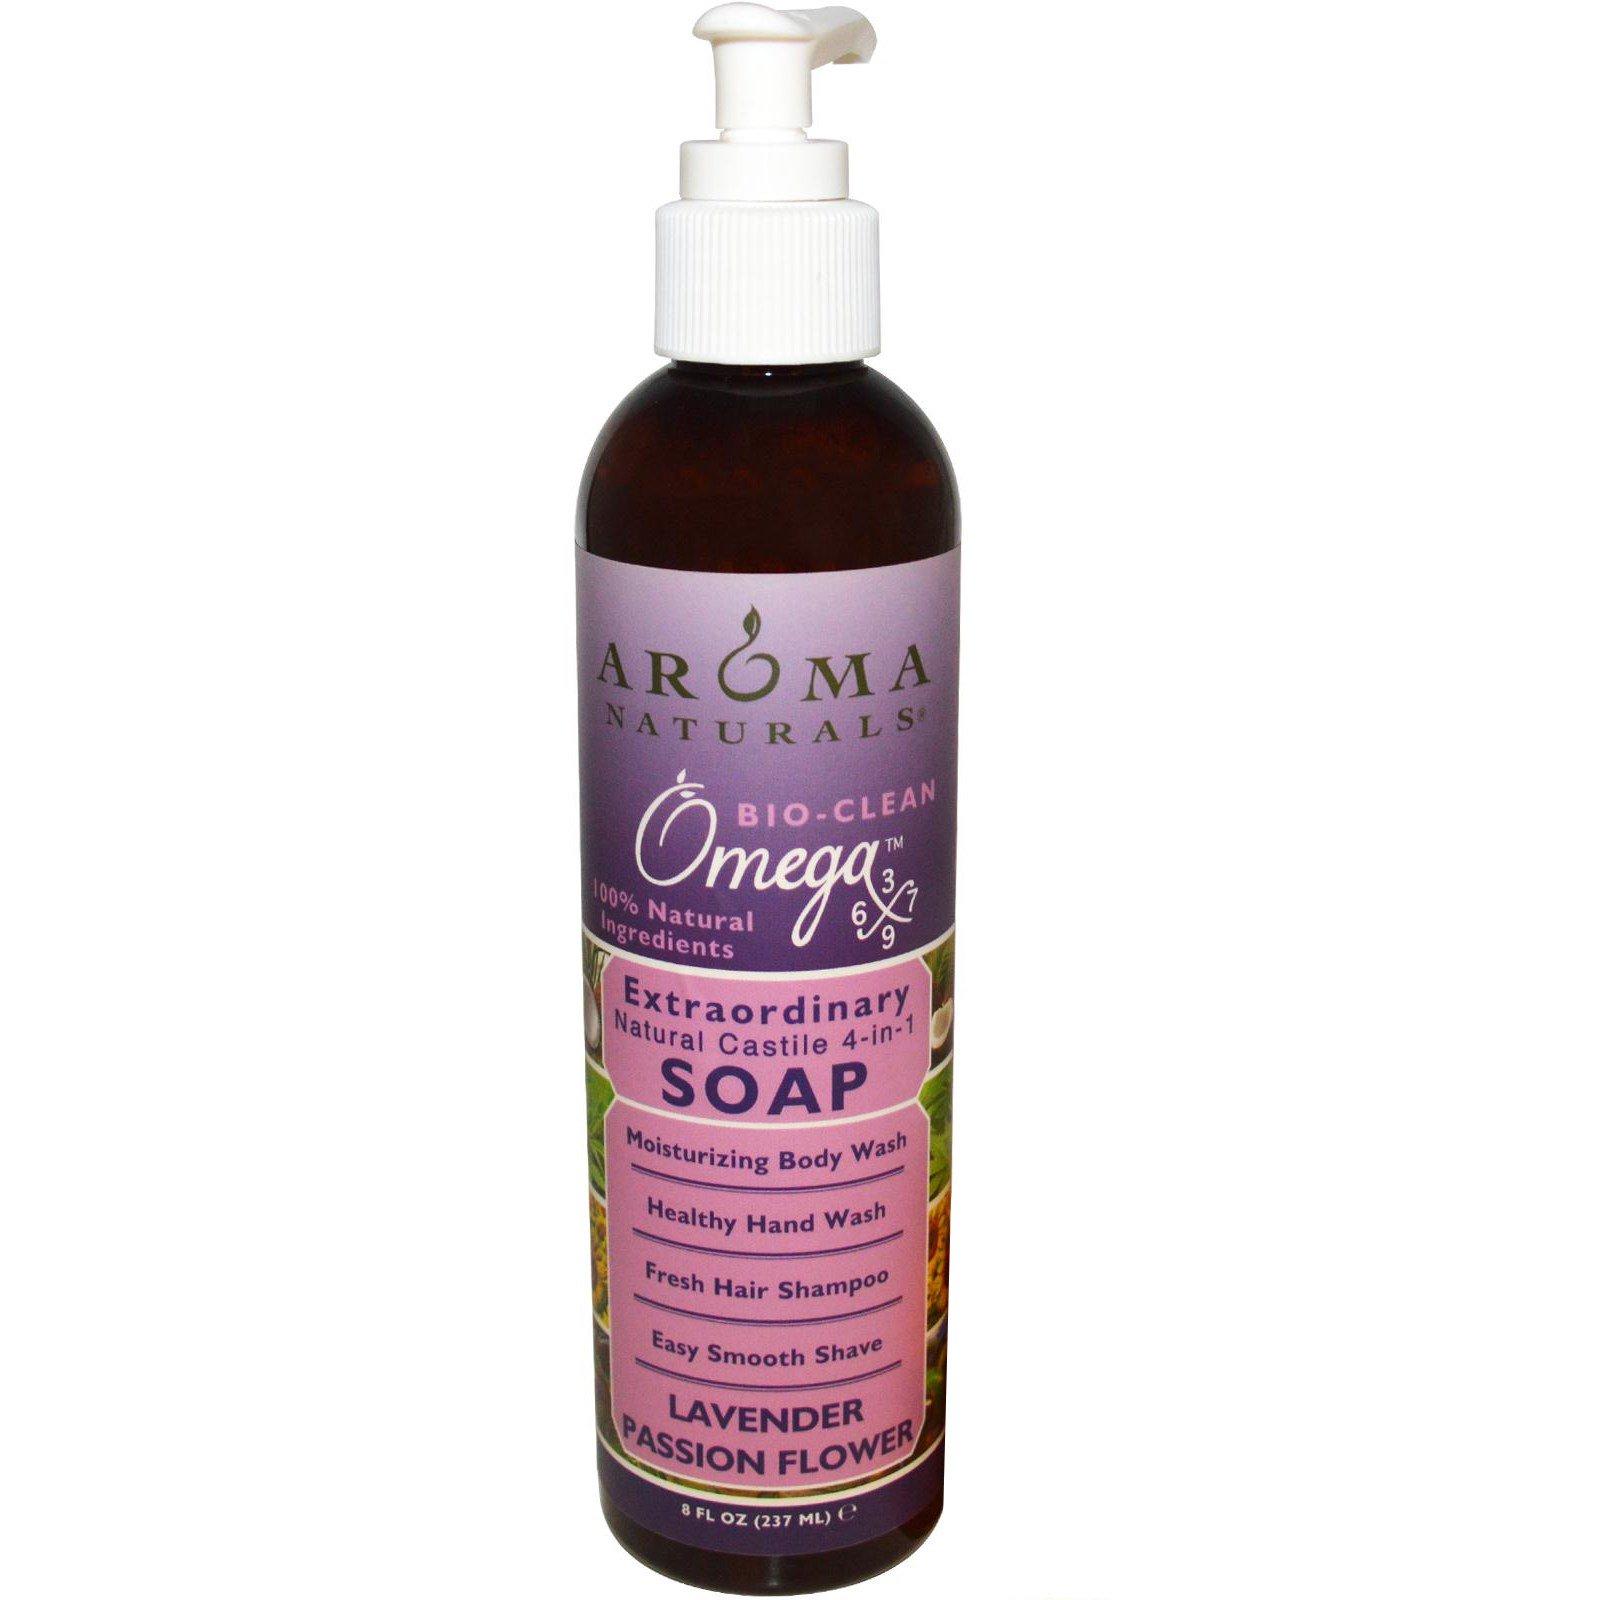 Aroma Naturals, 4-in-1 Soap, Lavender Passion Flower, 8 fl oz (237 ml)